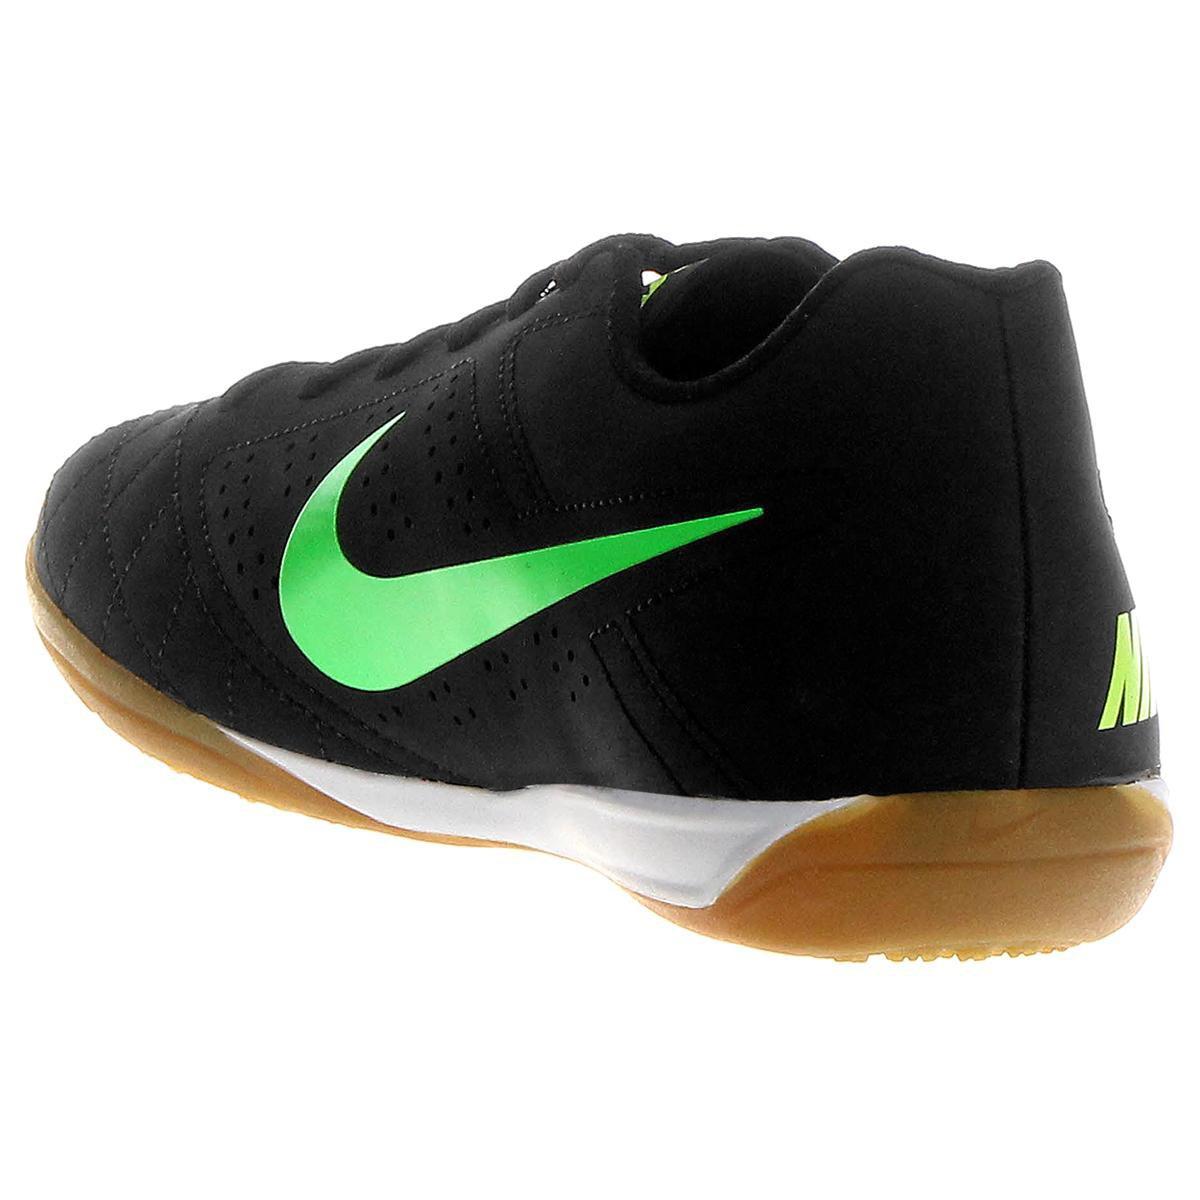 68af033922 Chuteira Futsal Nike Beco 2 Masculina Preto e Verde Limão - Compre ...